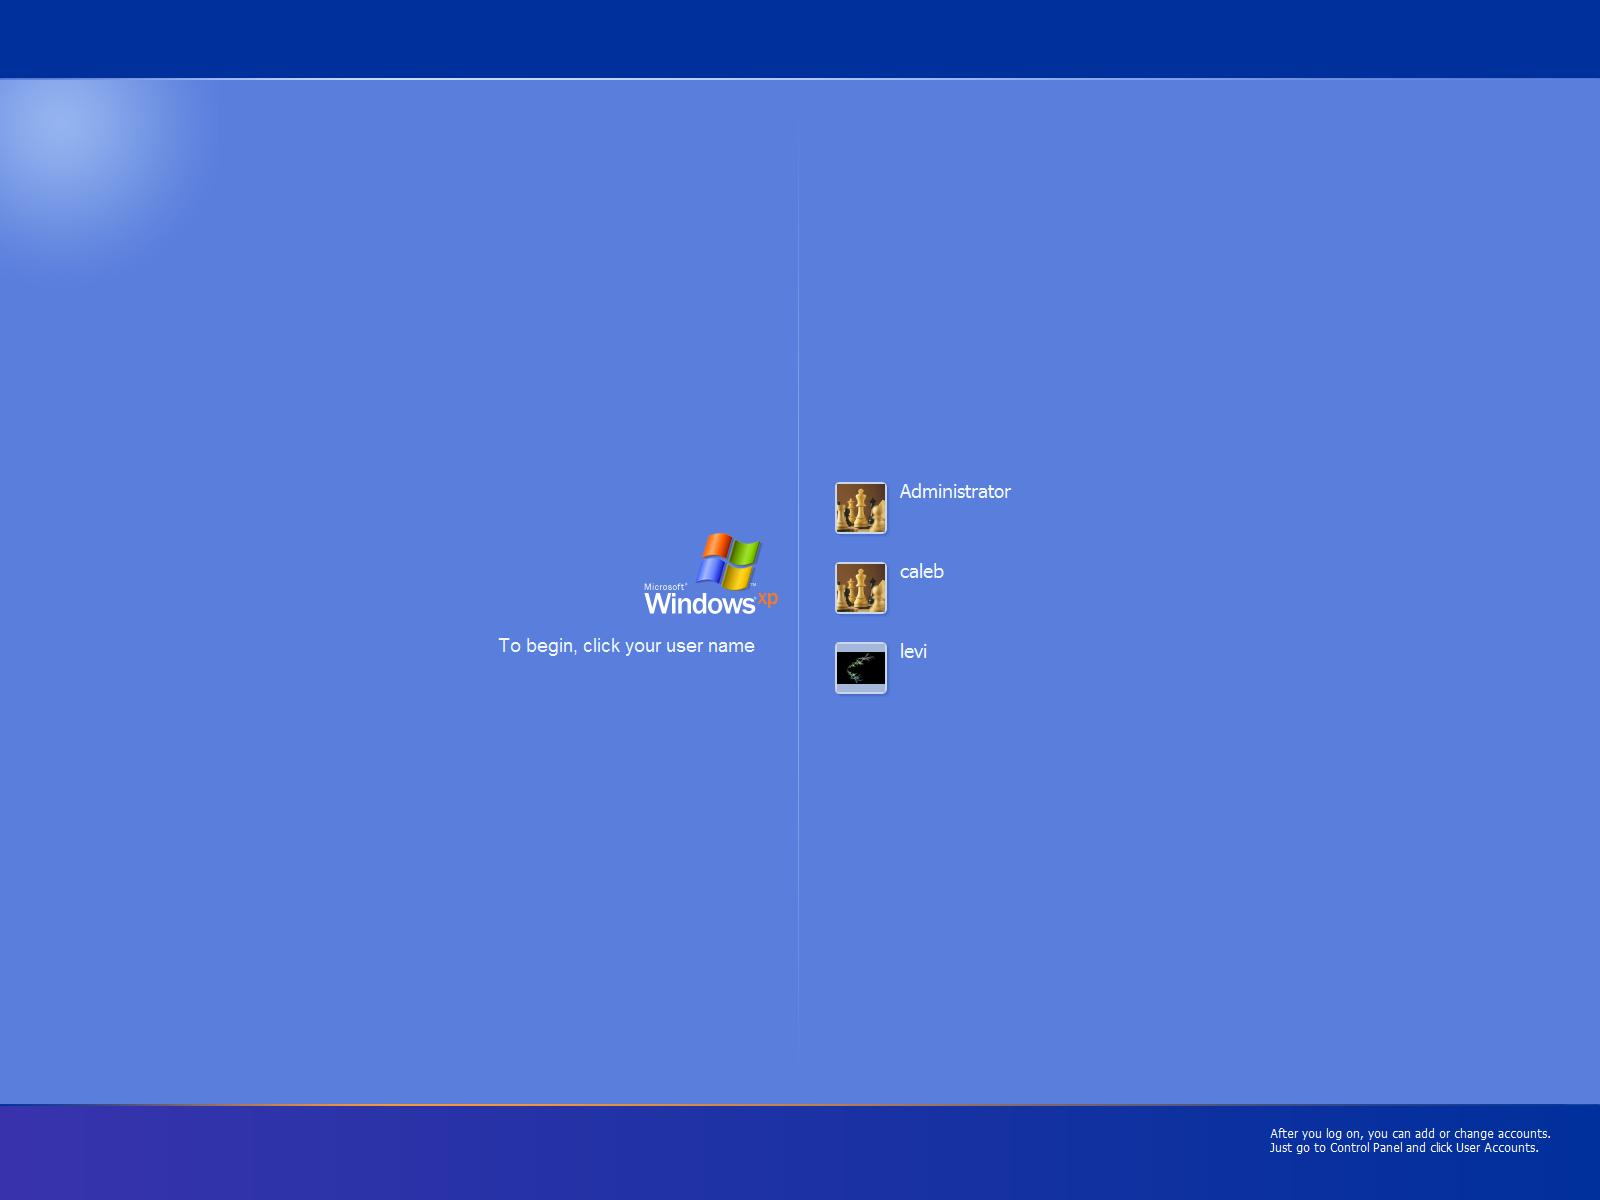 logonui.exe download windows xp